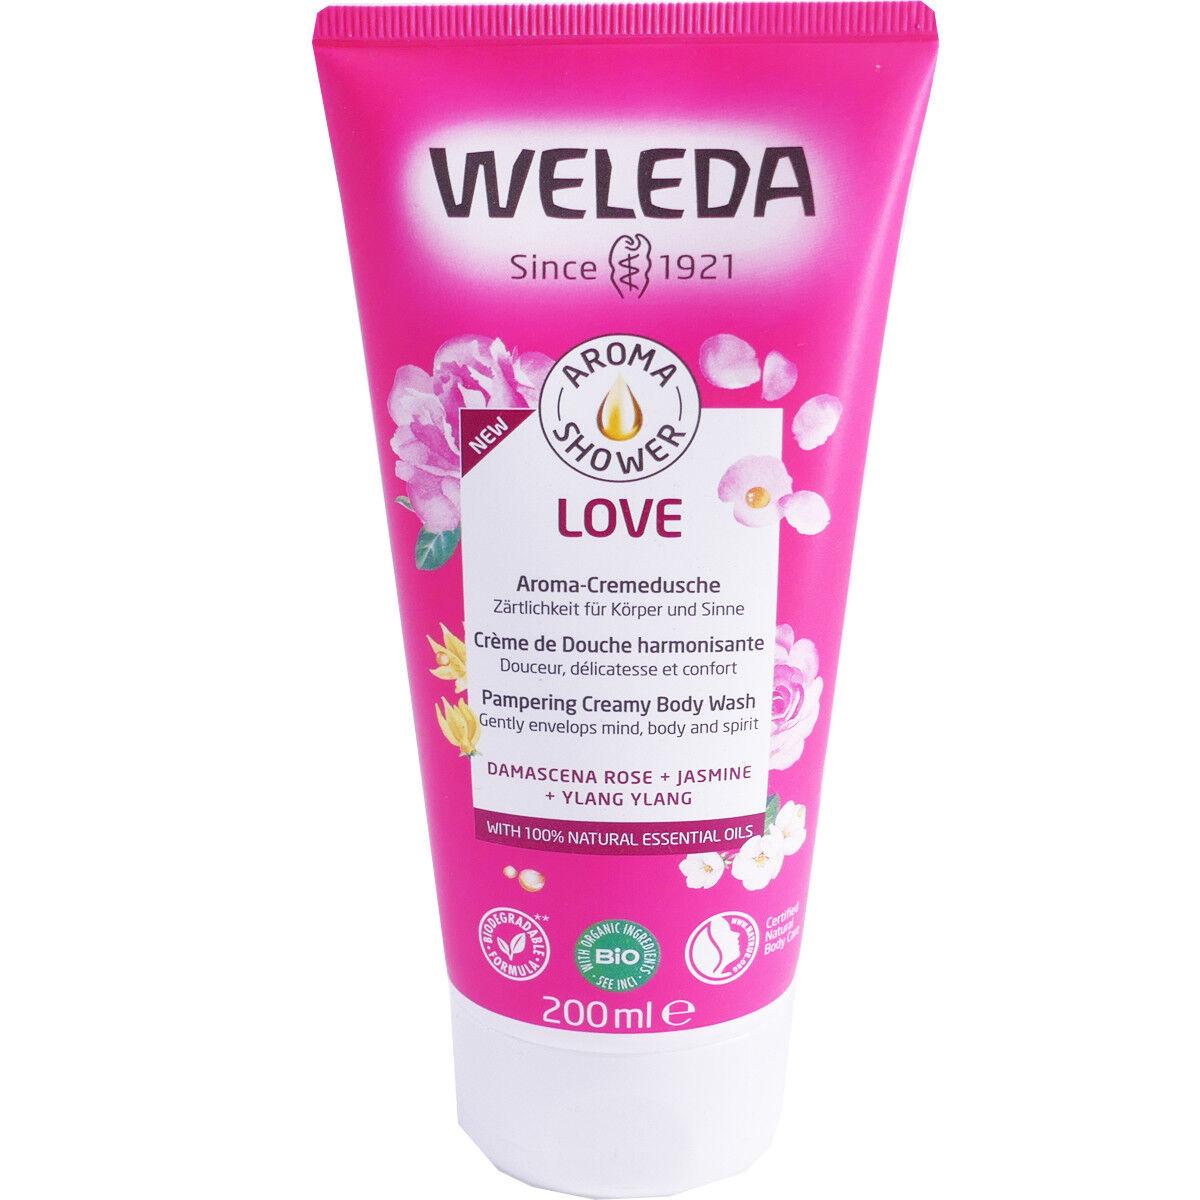 Weleda love creme de douche harmonisante bio 200ml